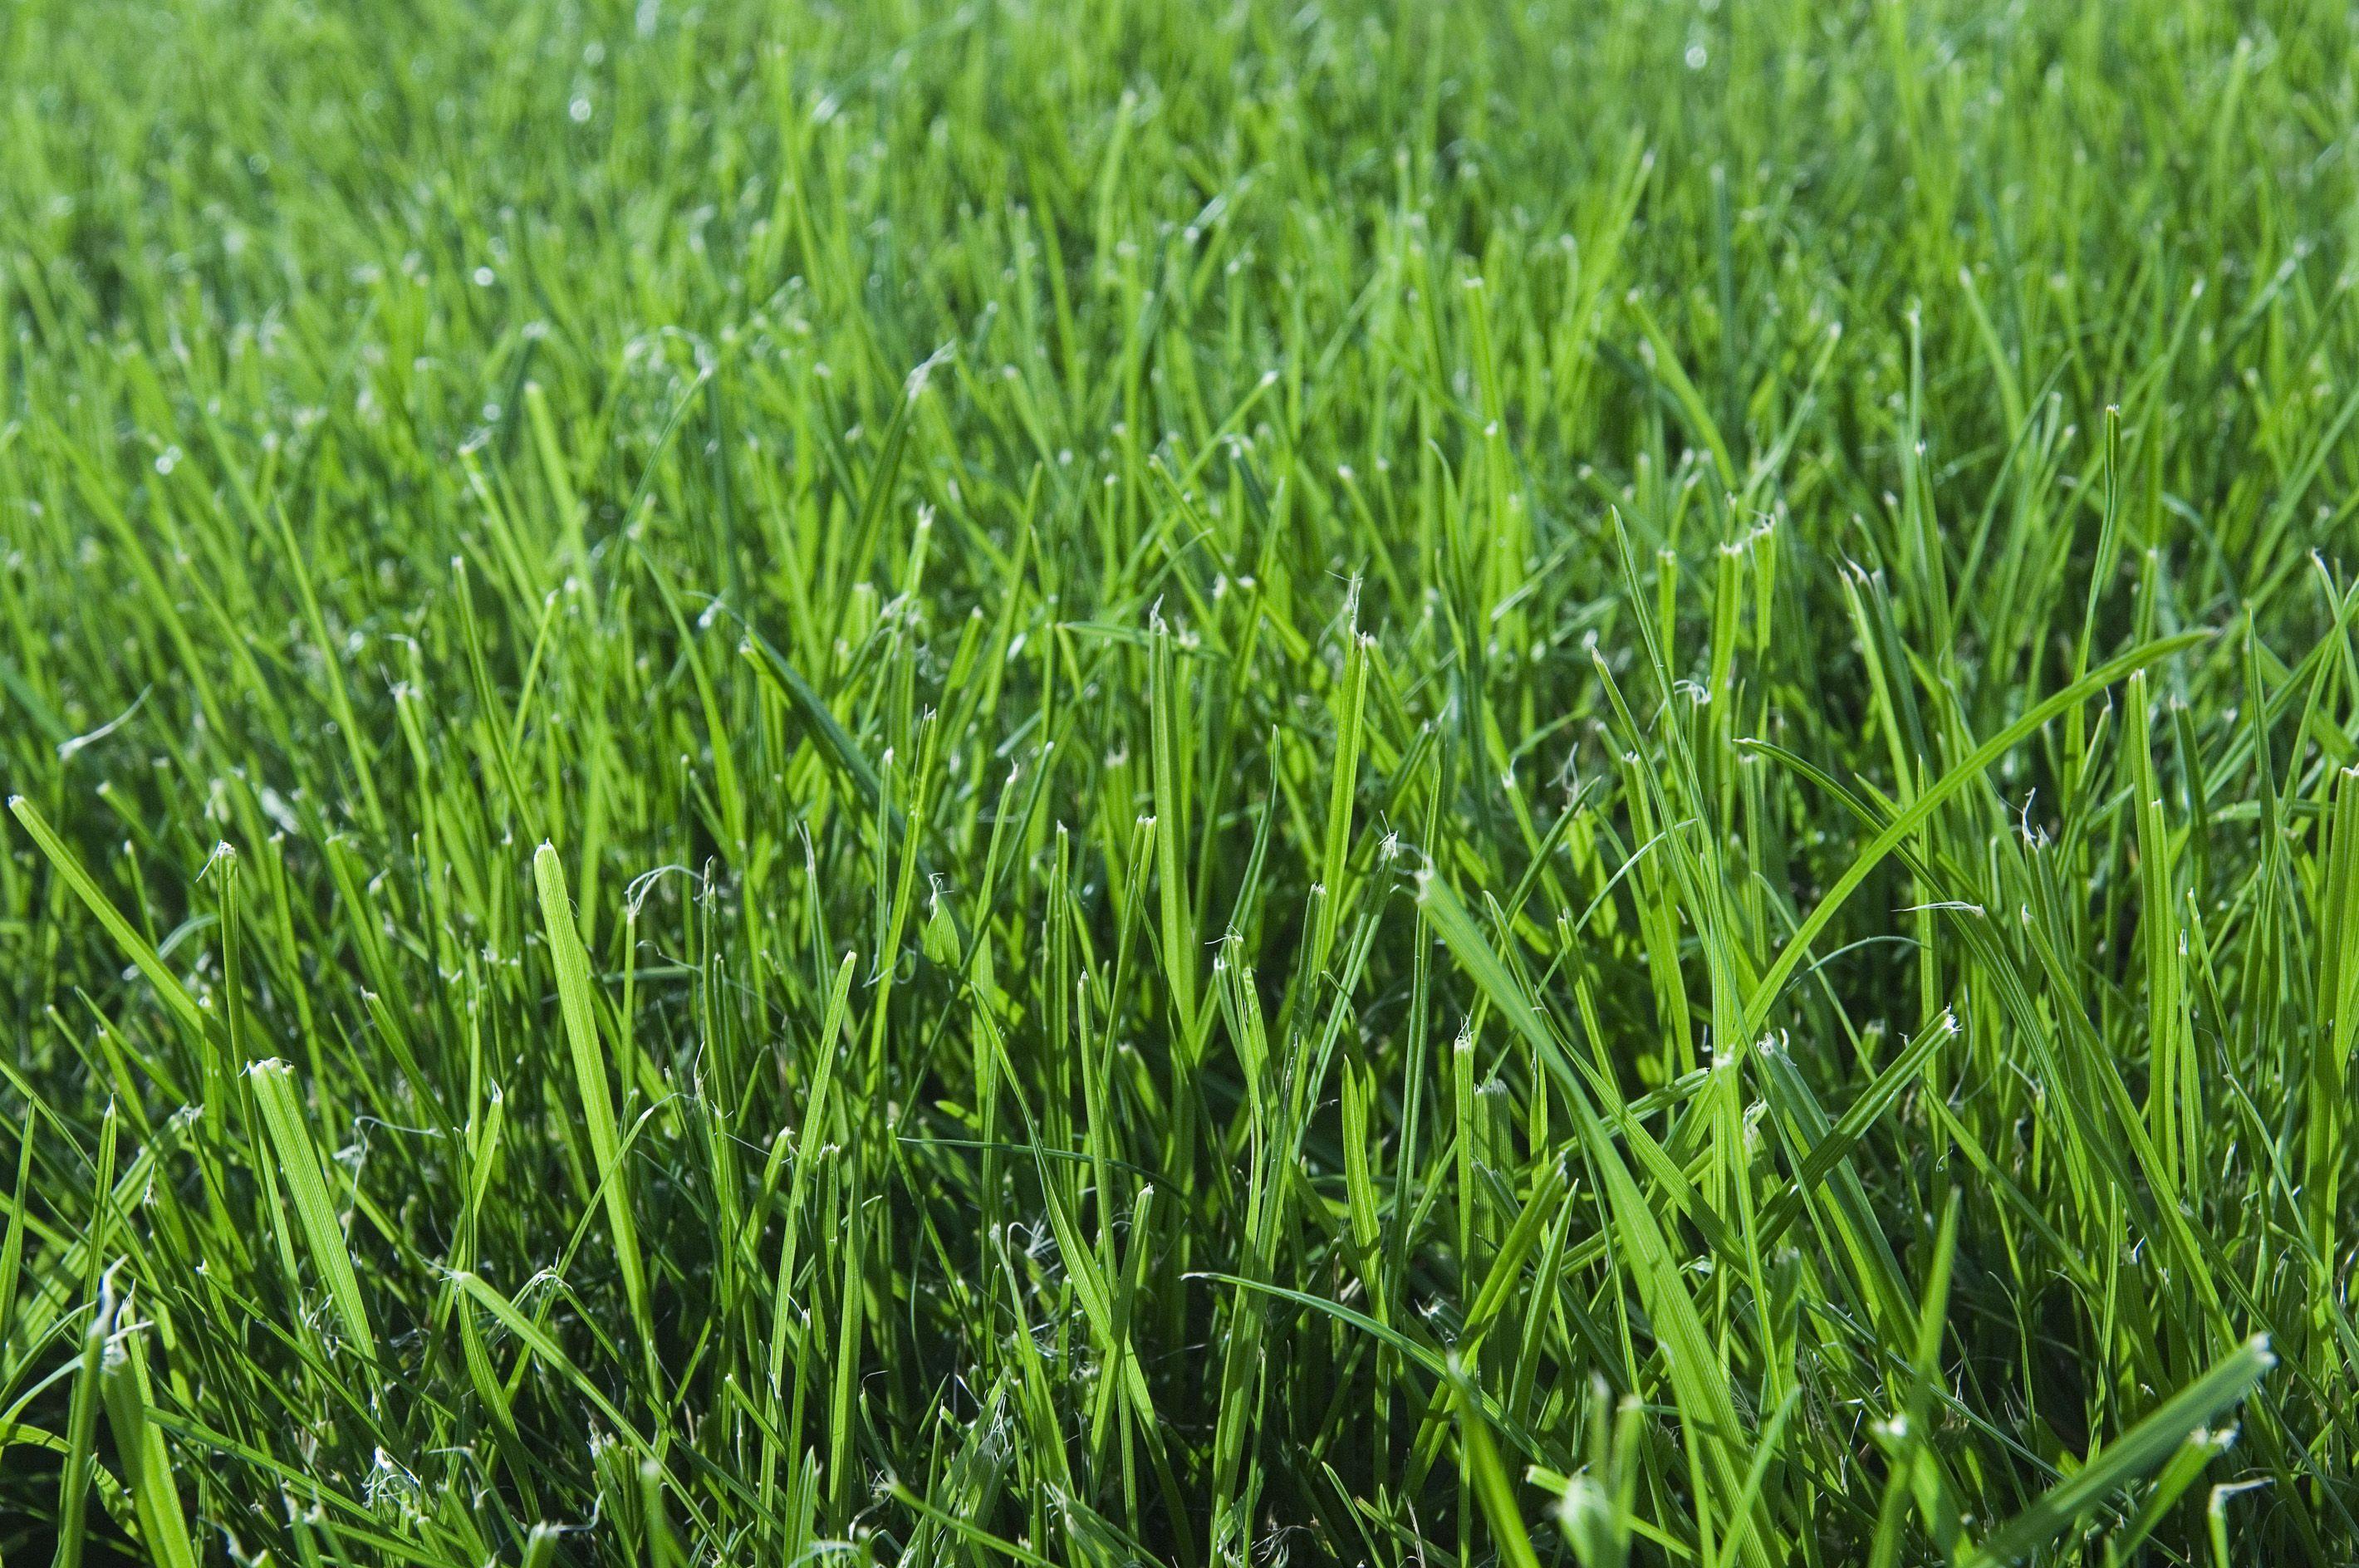 Broadleaf Weed Control In Lawns